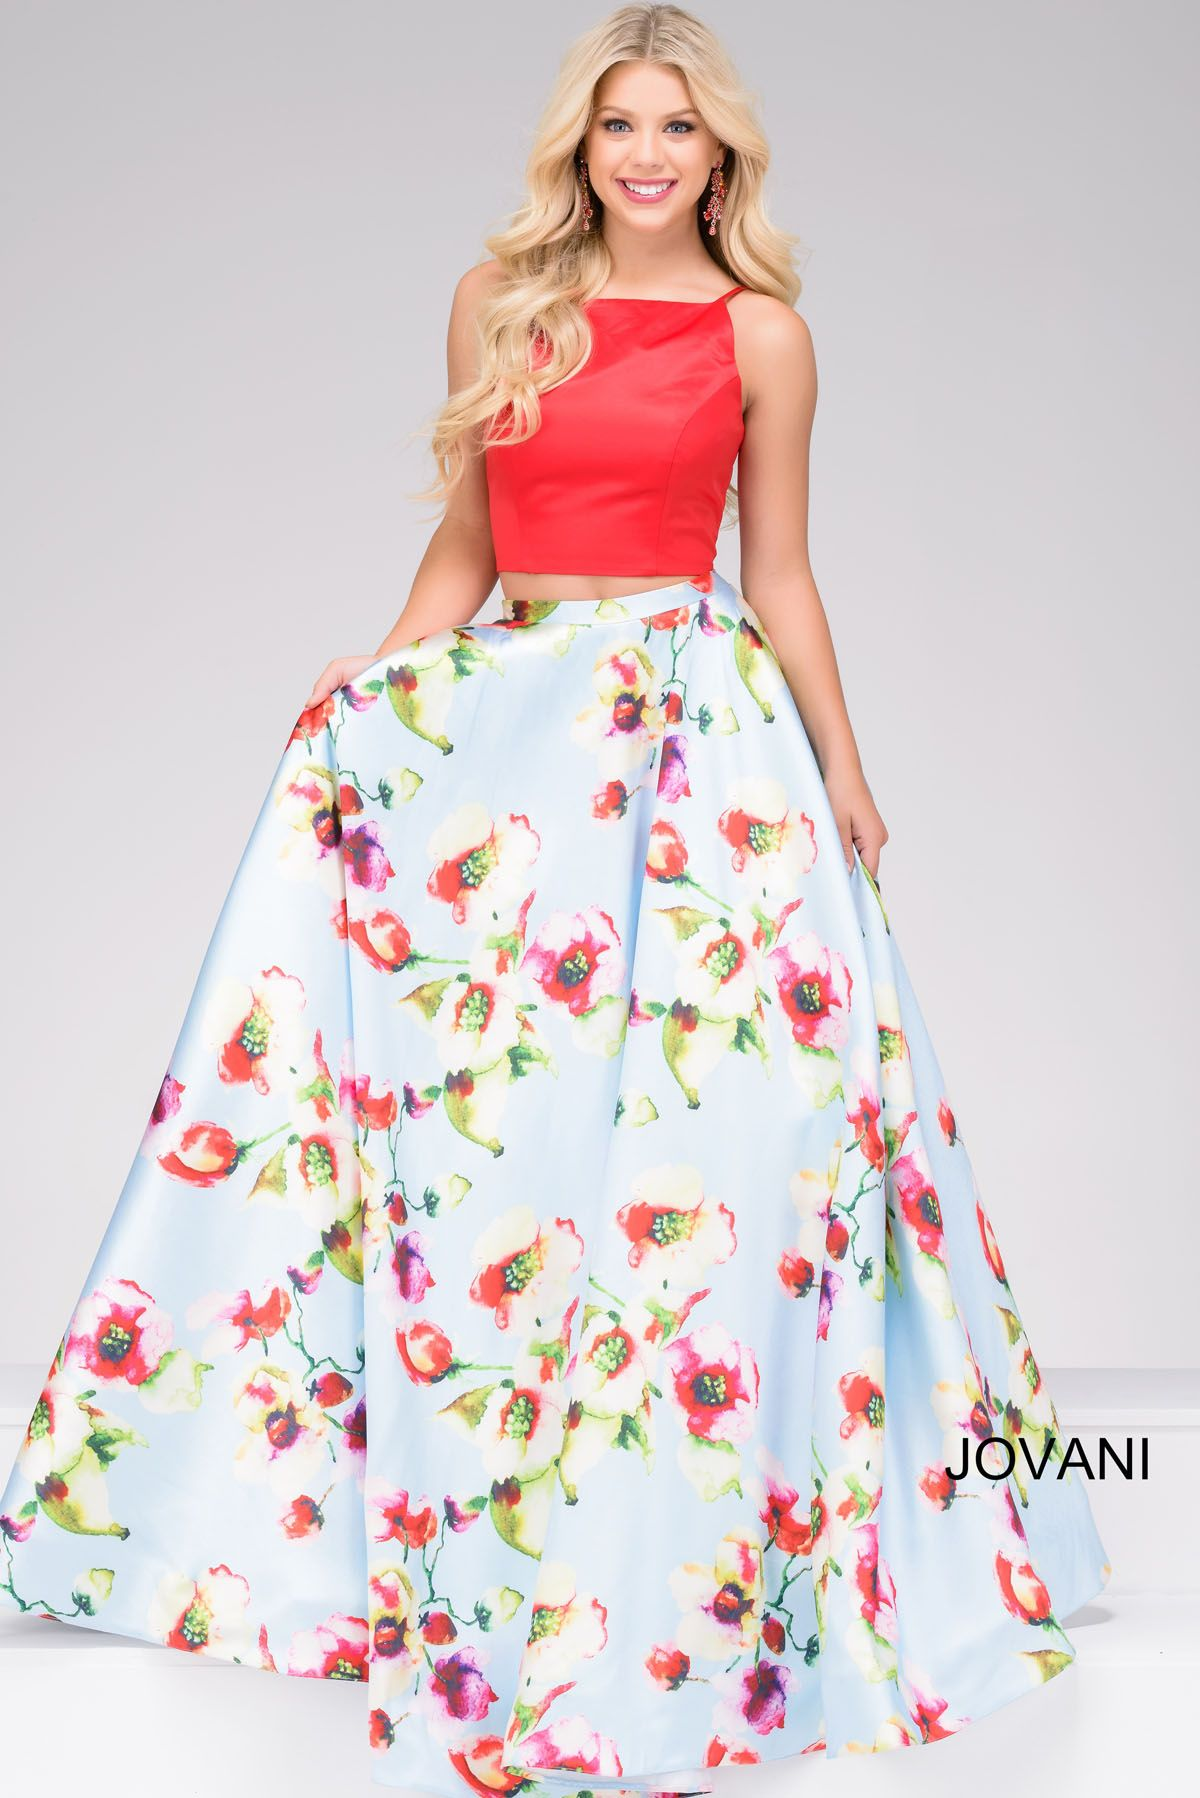 Jovani 49990 | Pinterest